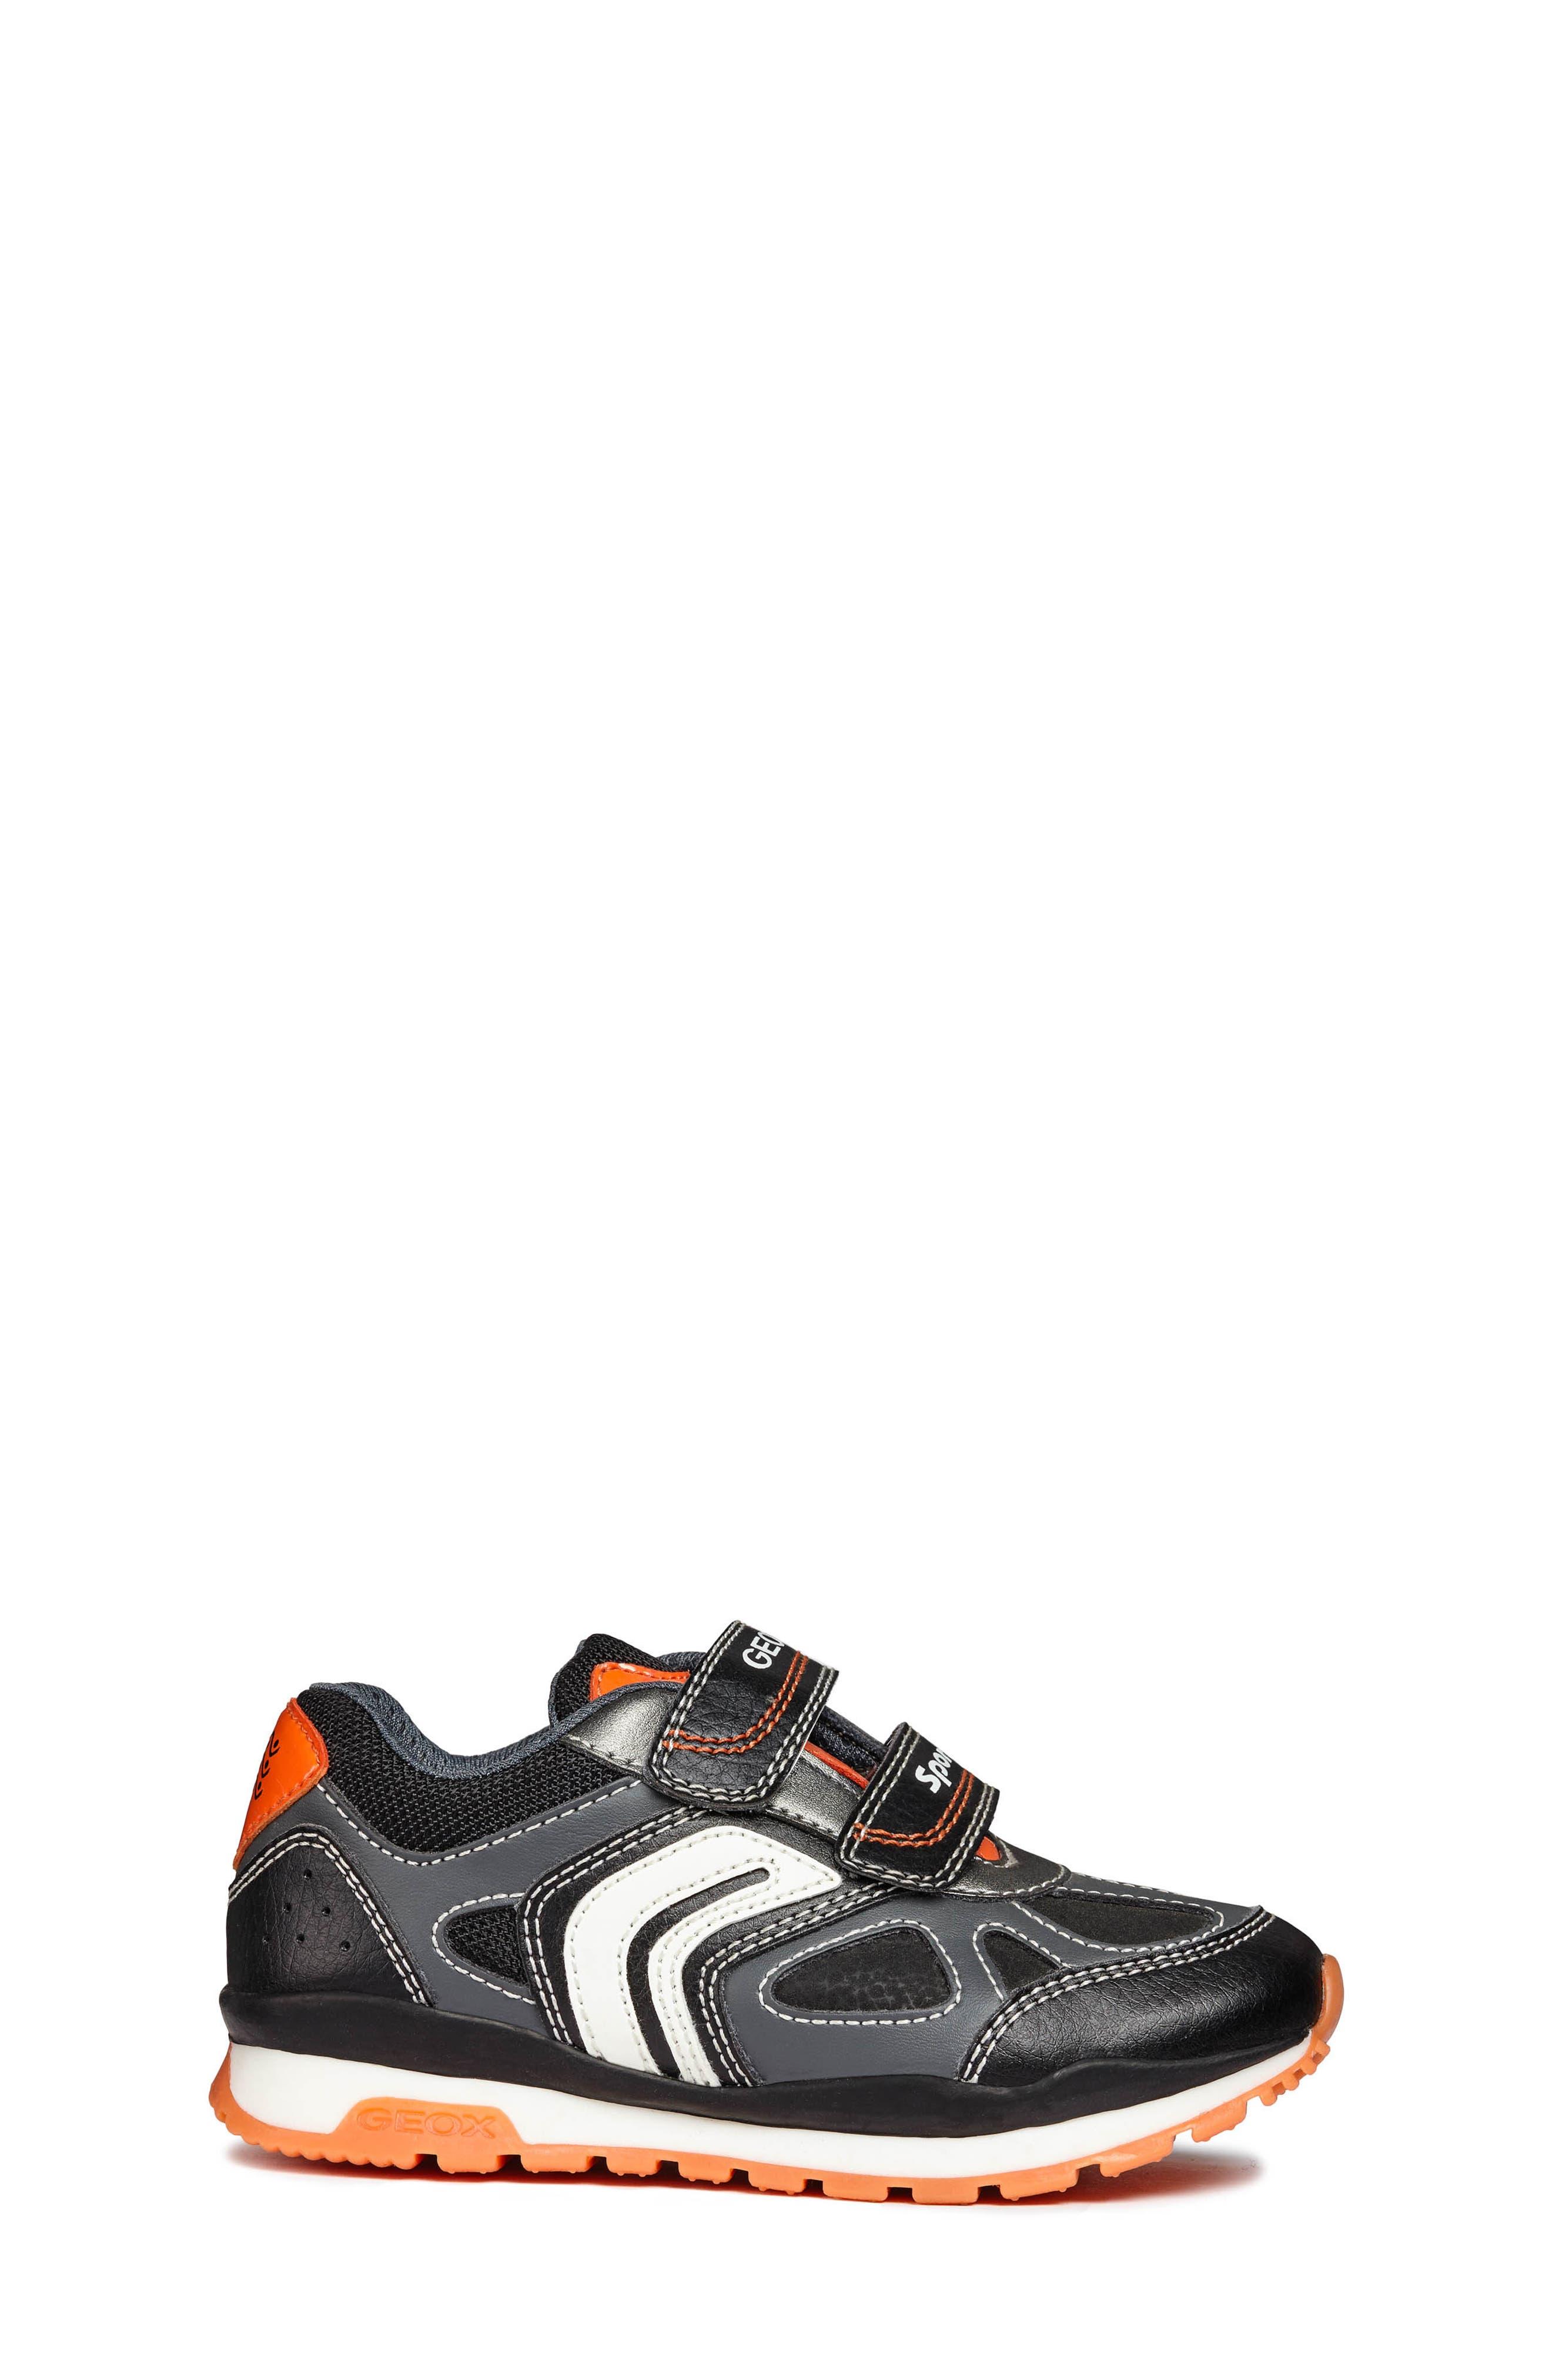 Pavel Sneaker,                             Alternate thumbnail 3, color,                             DARK GREY/ORANGE